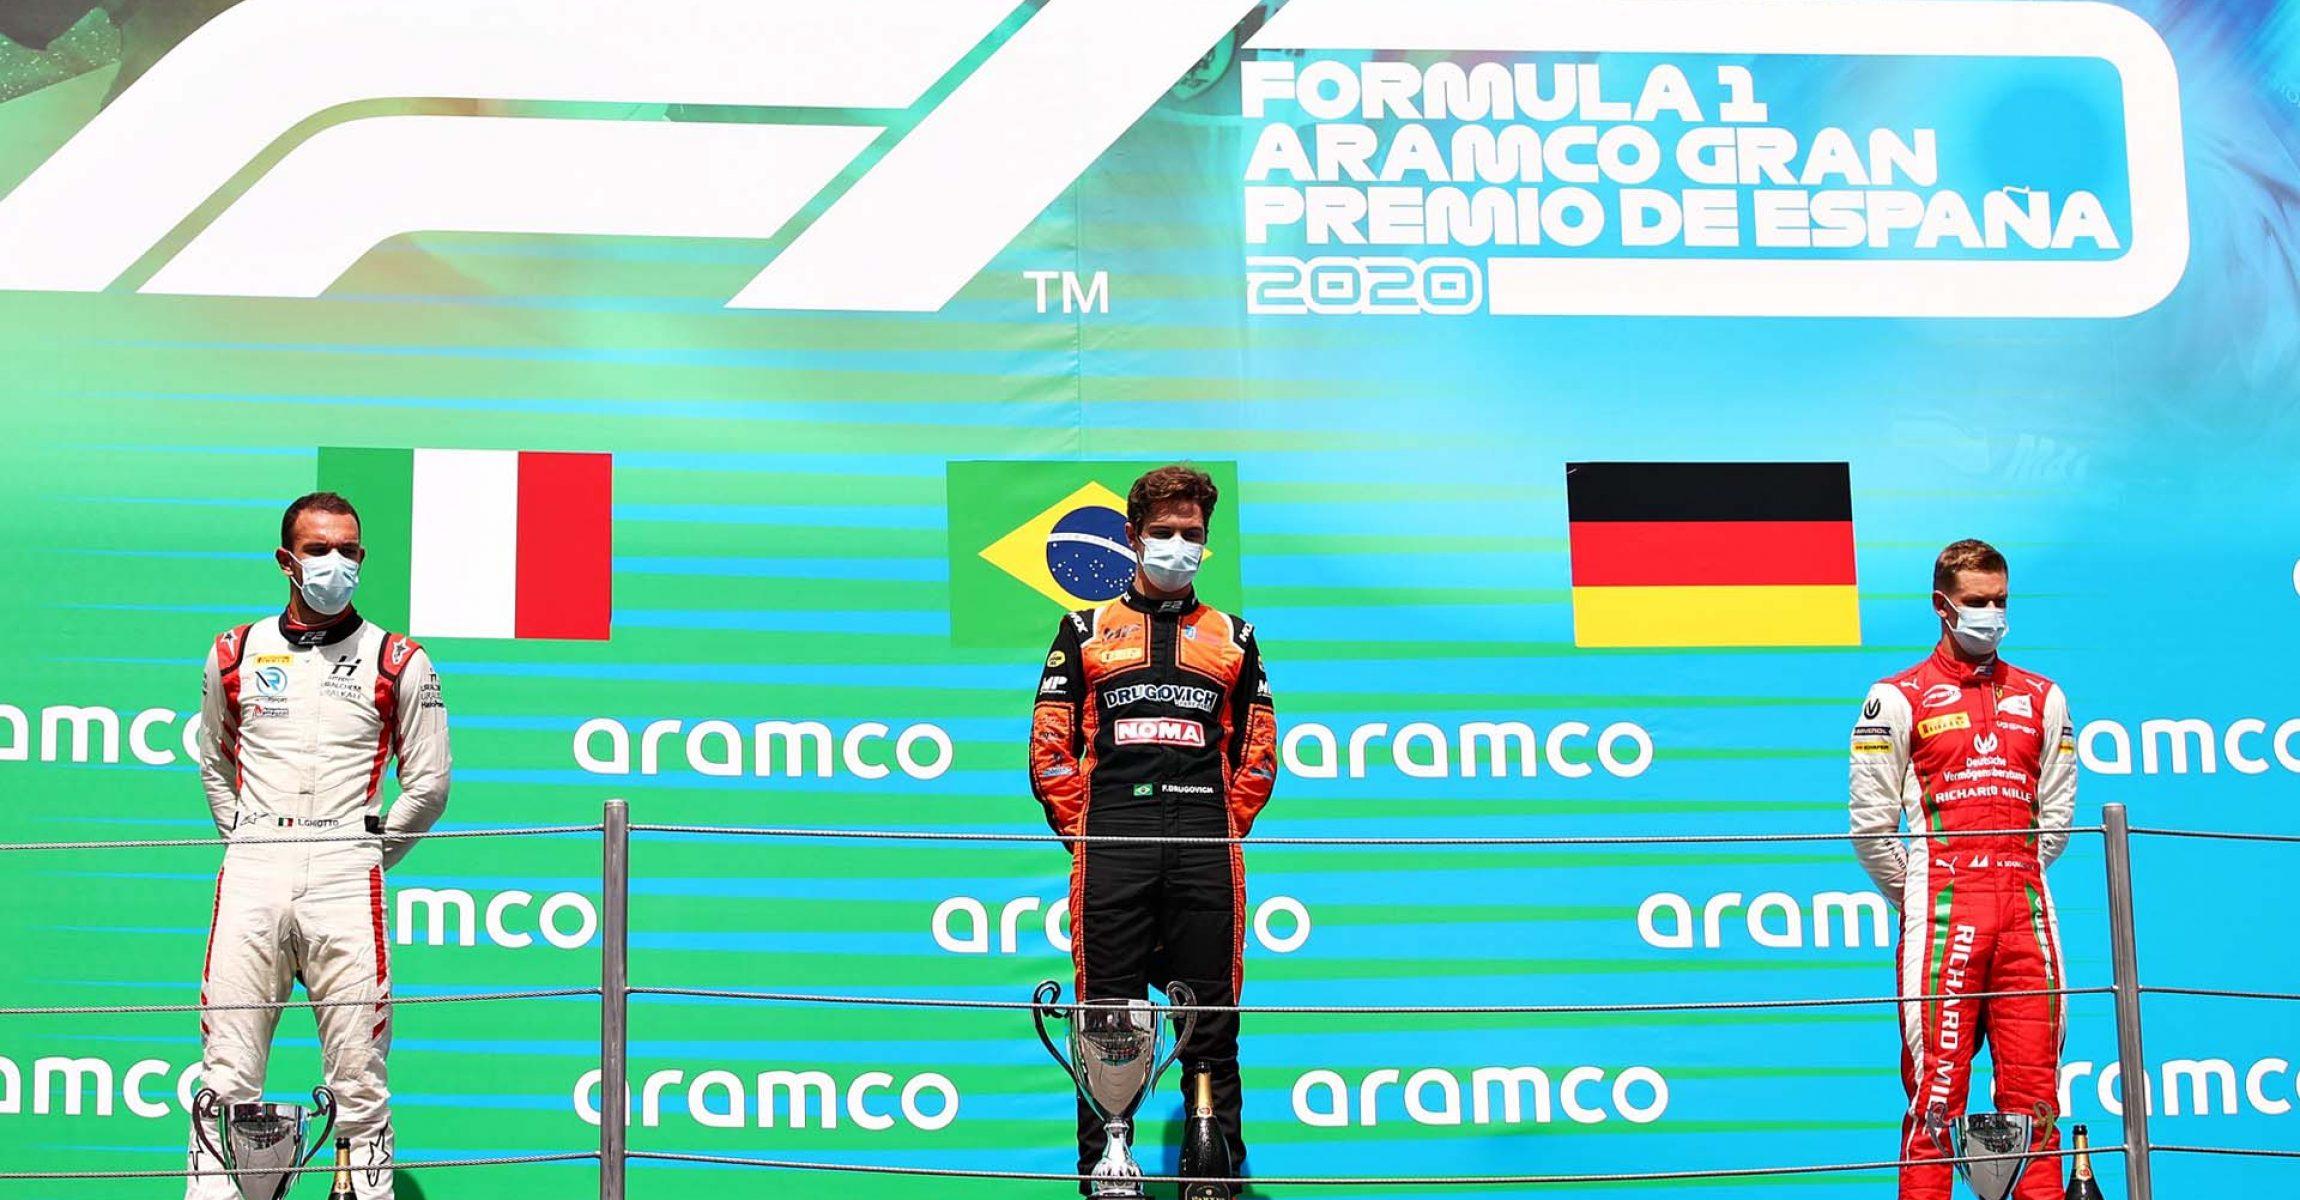 BARCELONA, SPAIN - AUGUST 16: <> during the sprint race of the Formula 2 Championship at Circuit de Barcelona-Catalunya on August 16, 2020 in Barcelona, Spain. (Photo by Joe Portlock - Formula 1/Formula 1 via Getty Images)